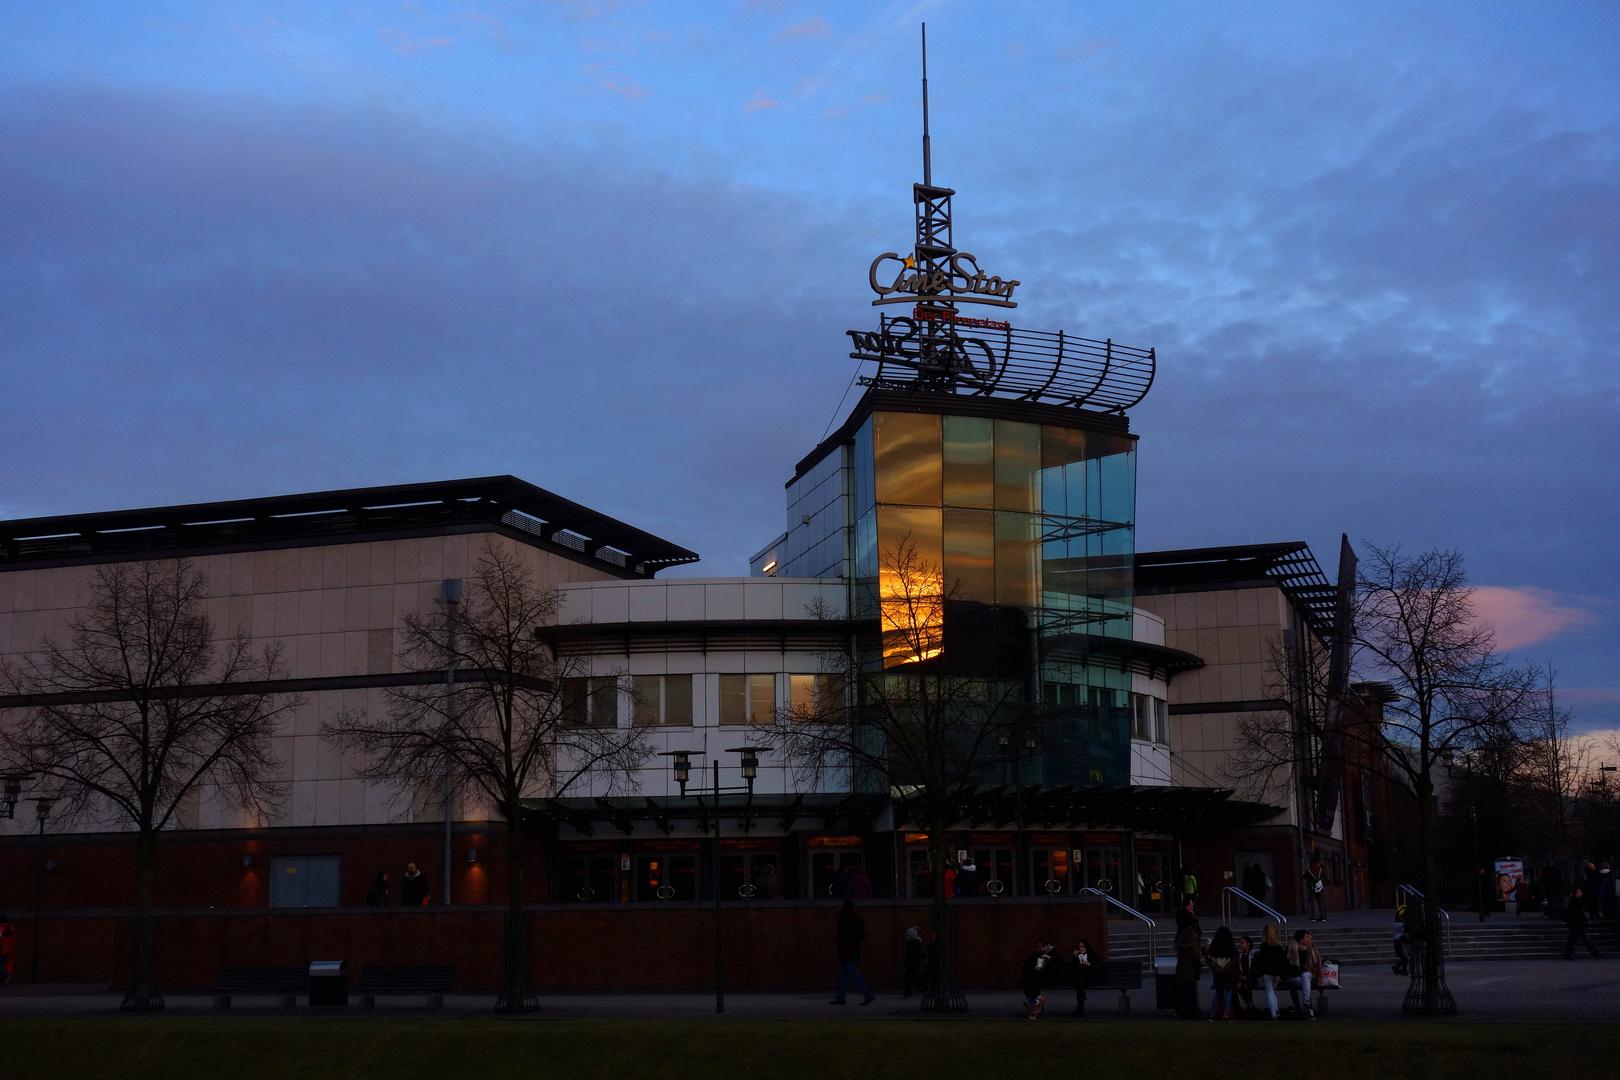 Kino Oberhausen Programm